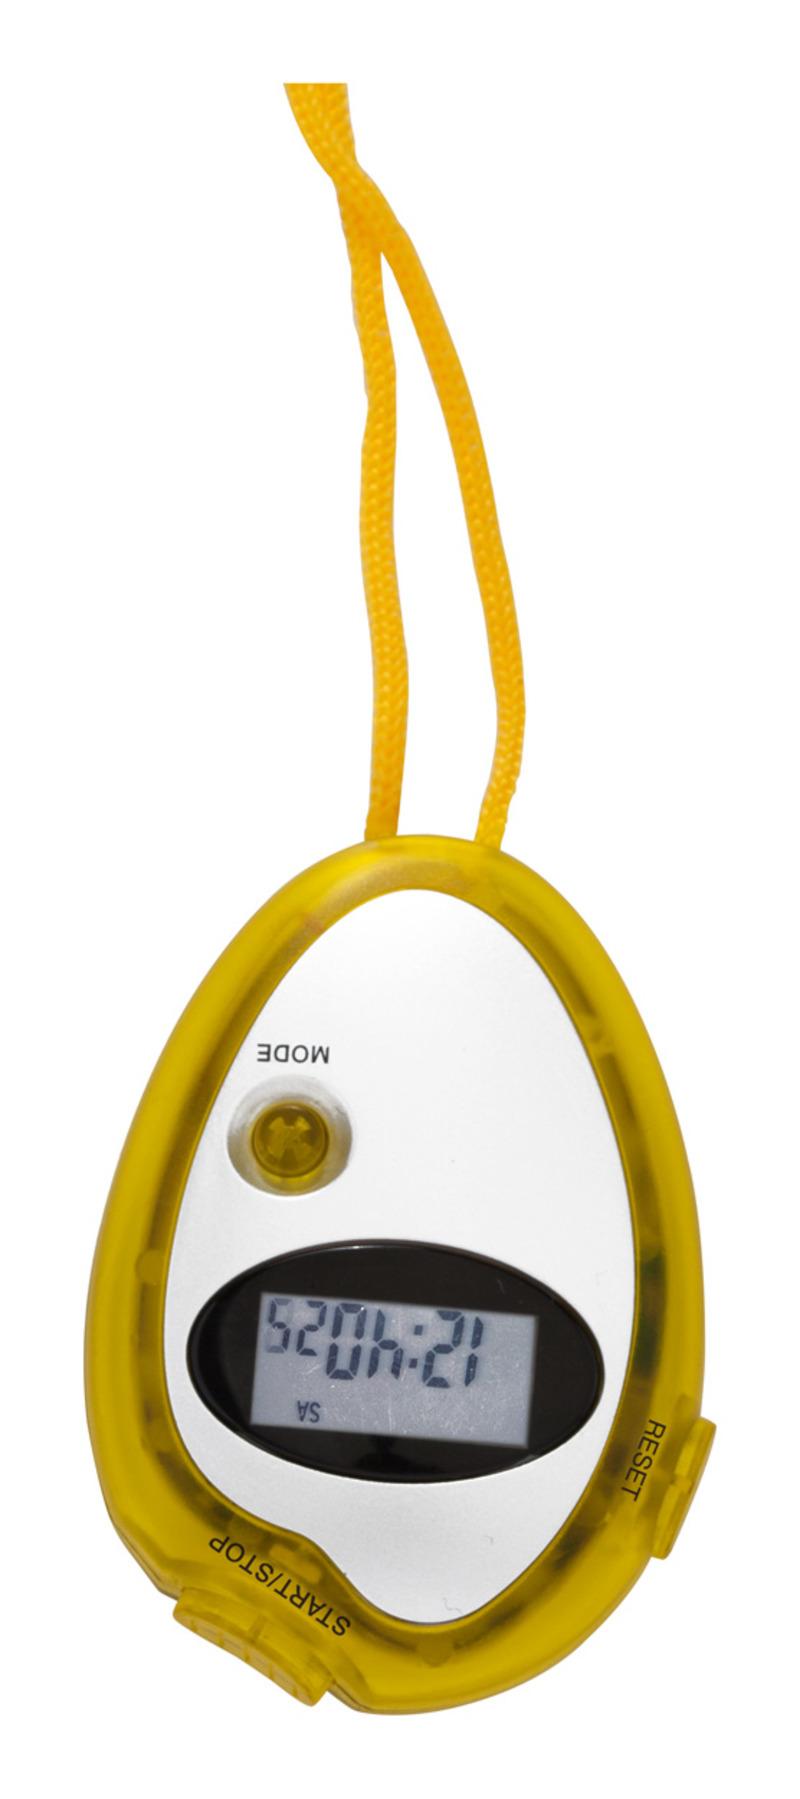 Kailen stopwatch